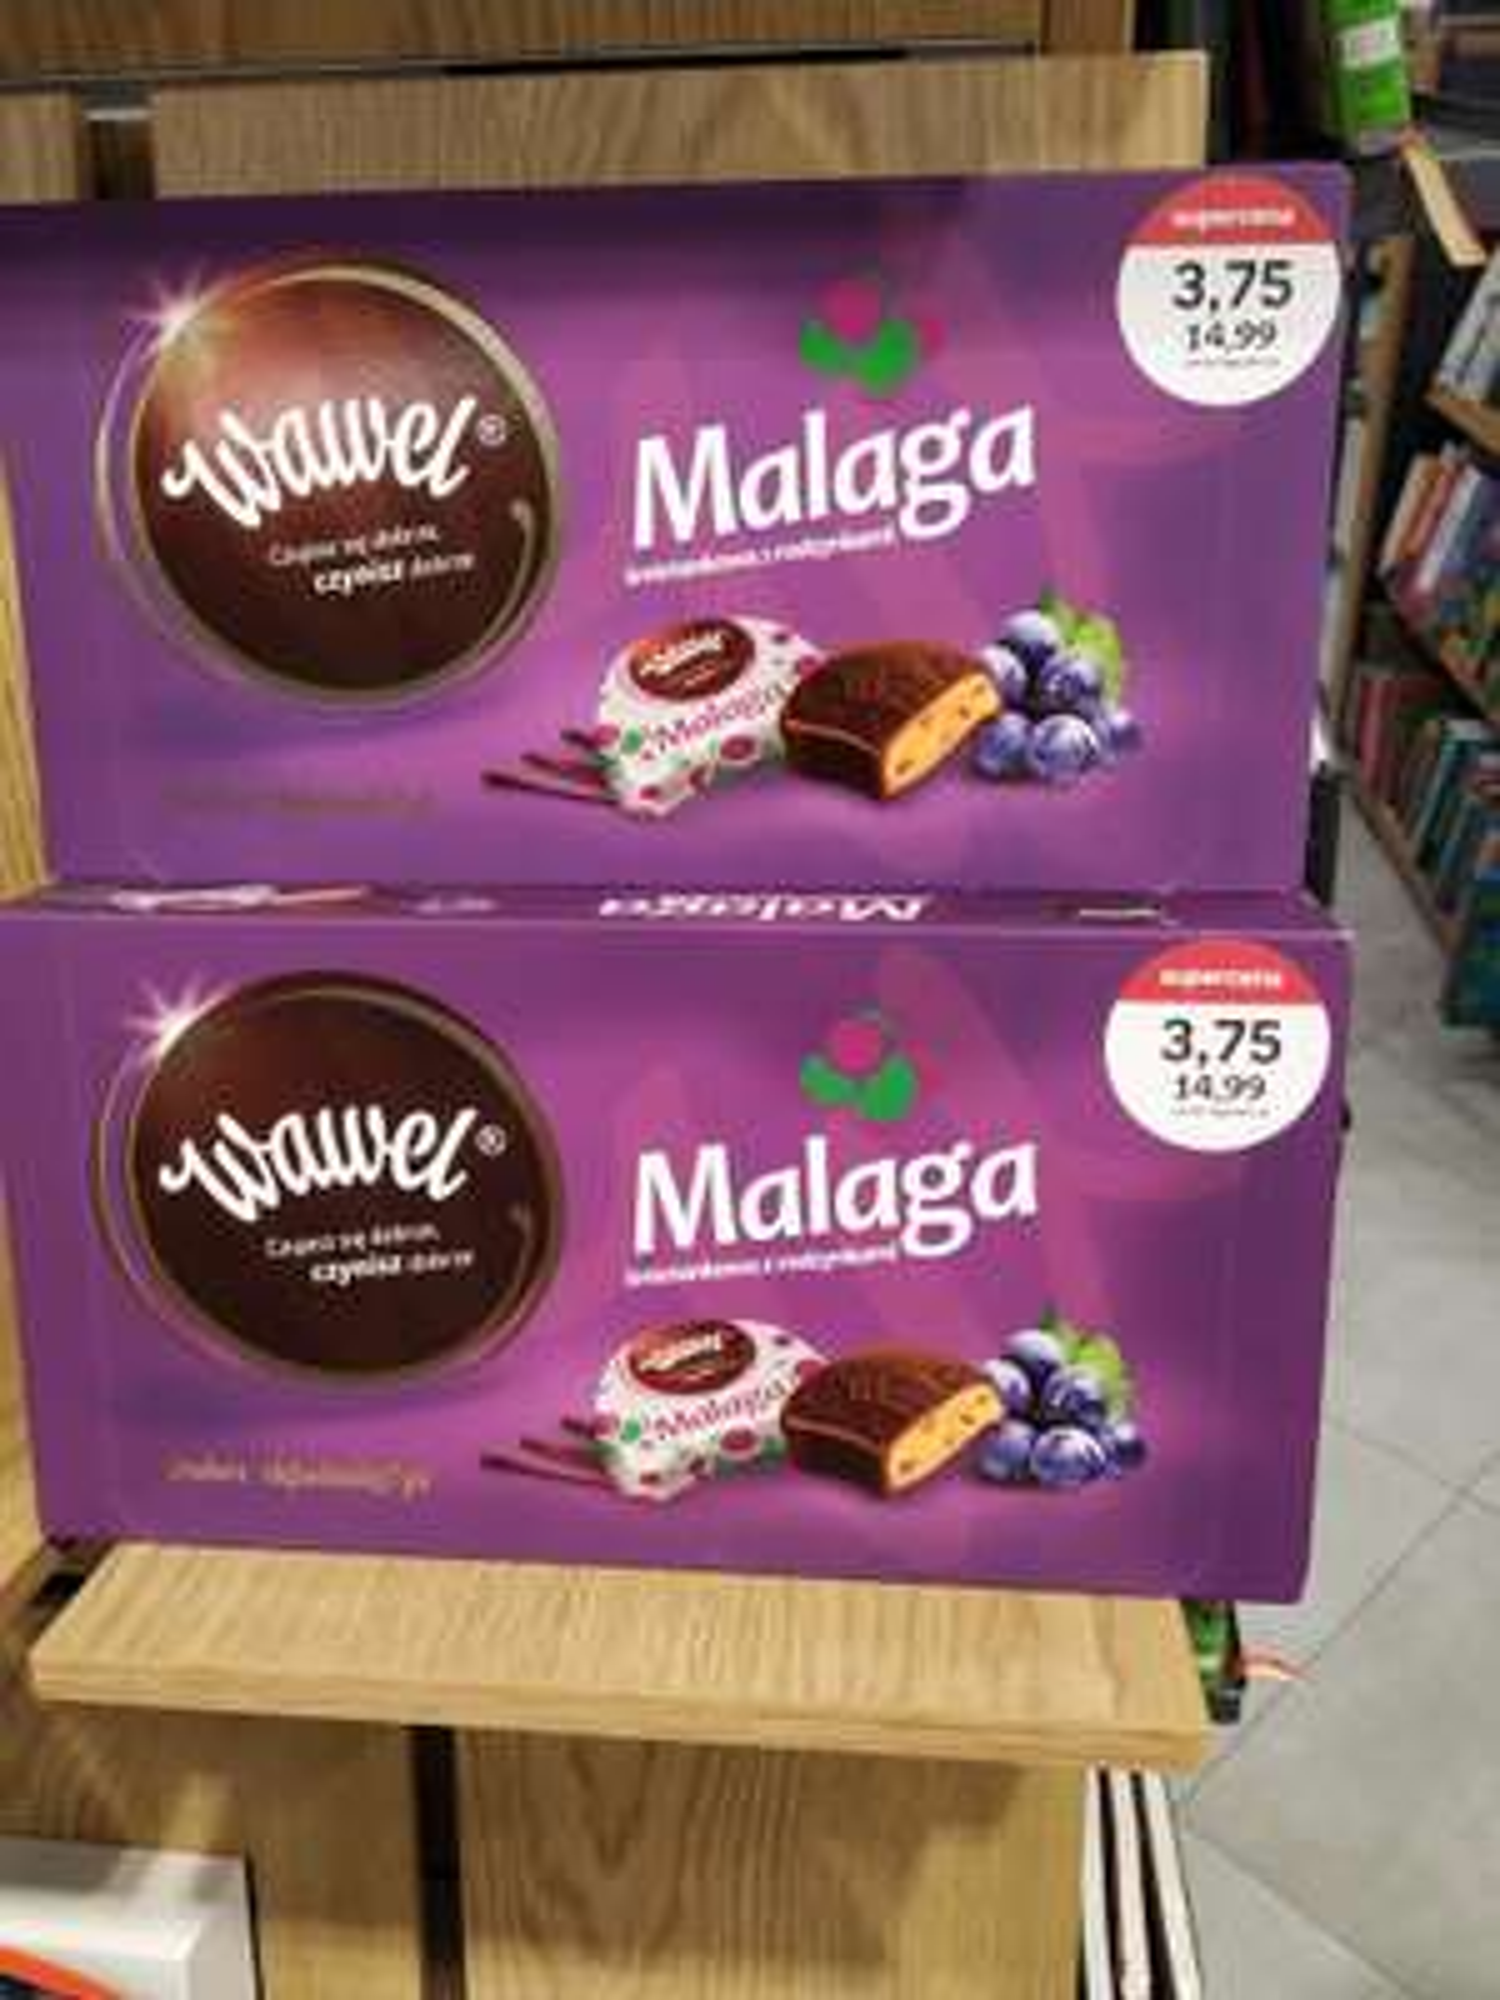 Cukierki Wawel Malaga w Empiku Warszawa